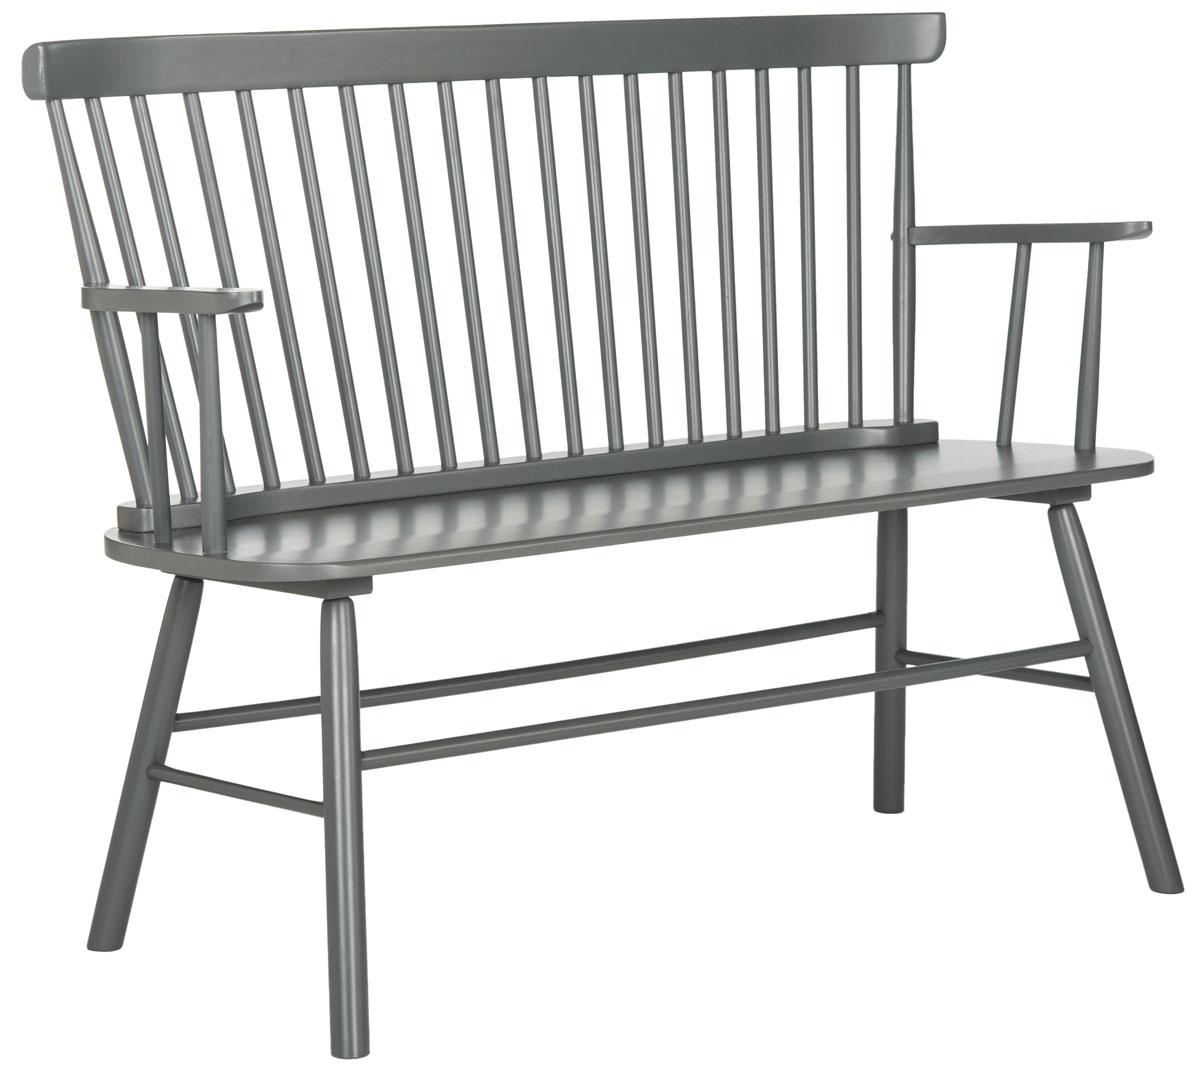 AMH8513C Loveseats/Settees - Furniture by Safavieh